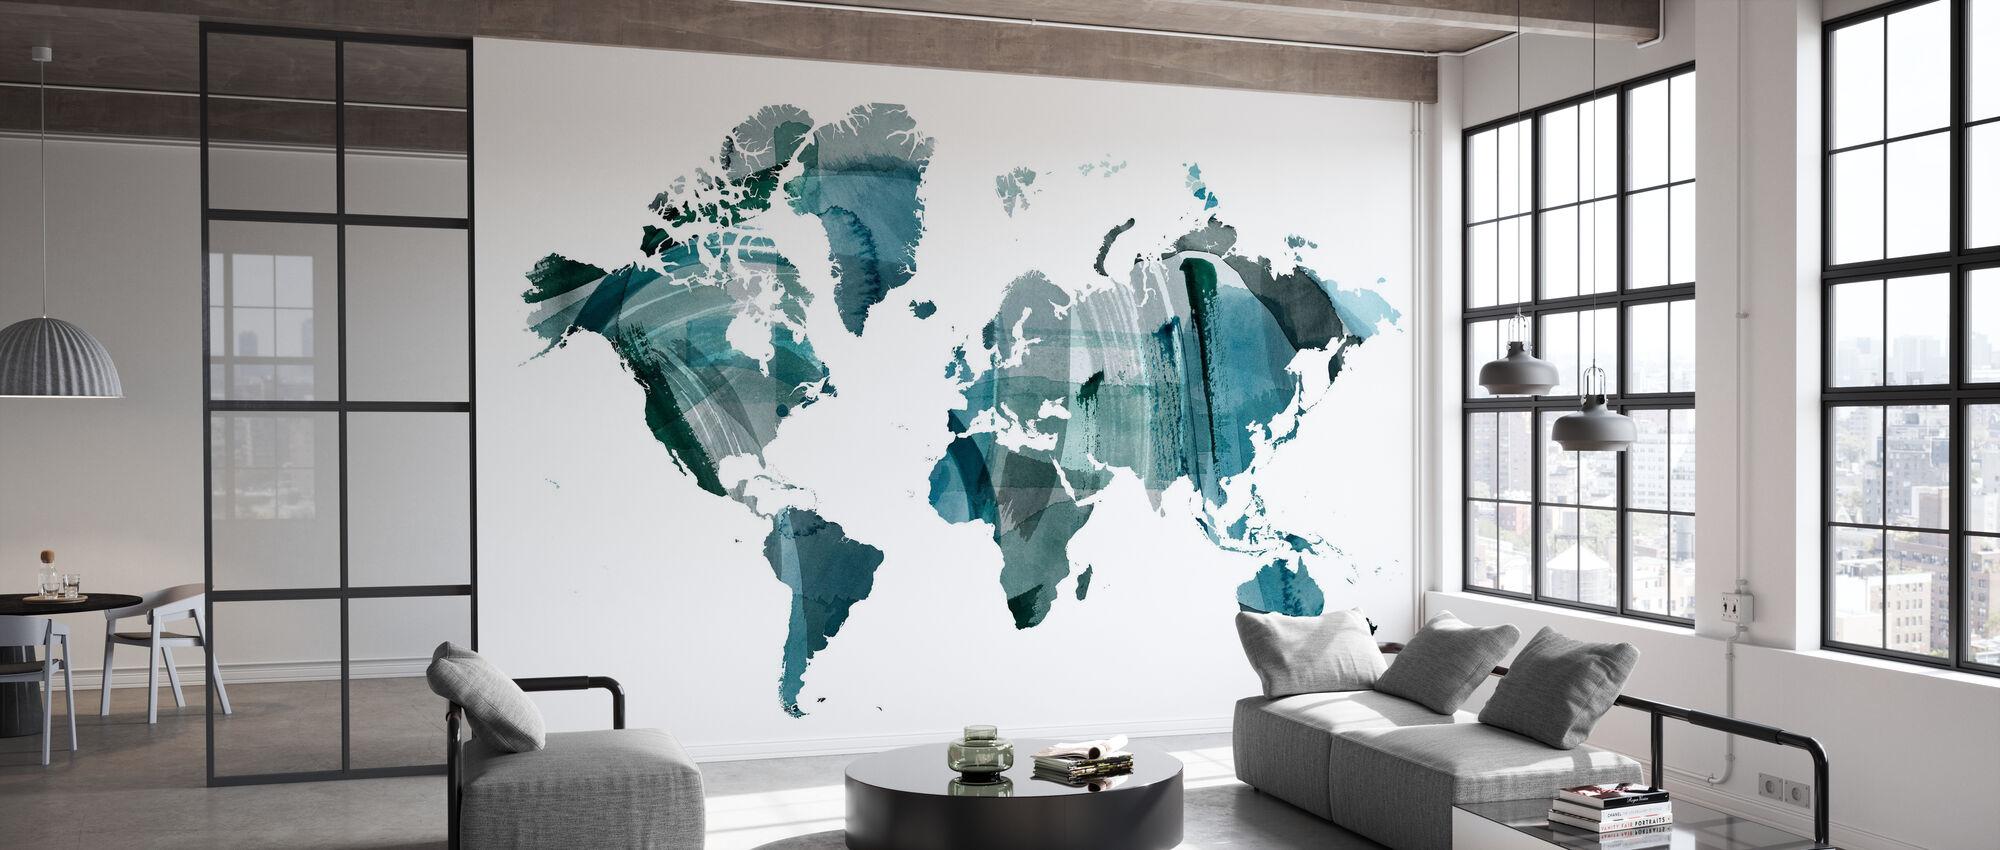 World Wash - Tapete - Büro